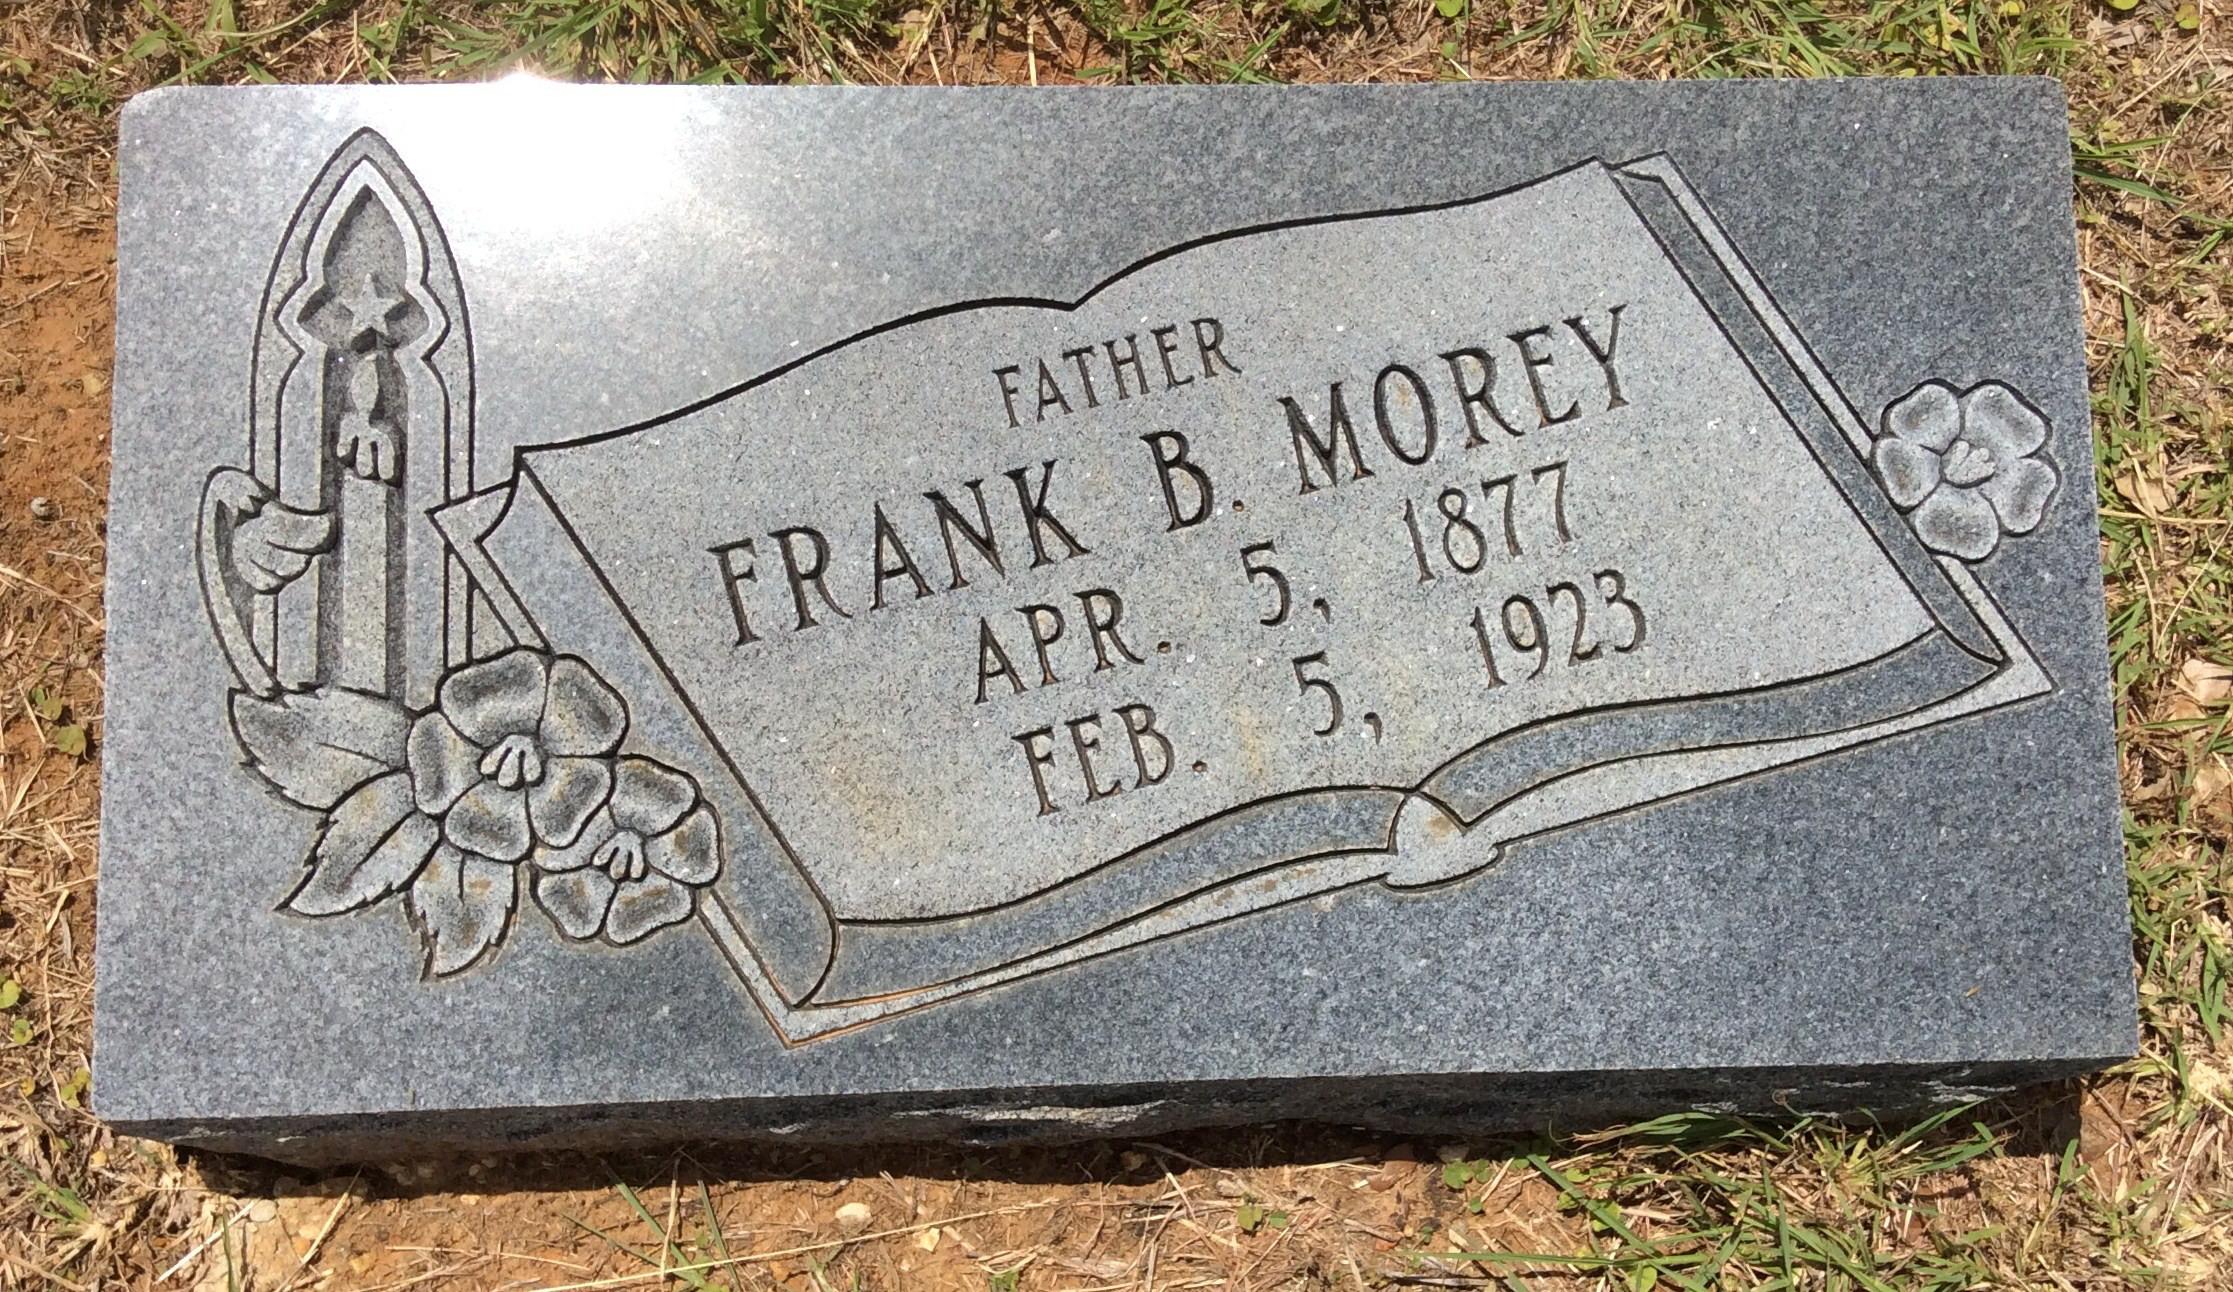 Frank Morey